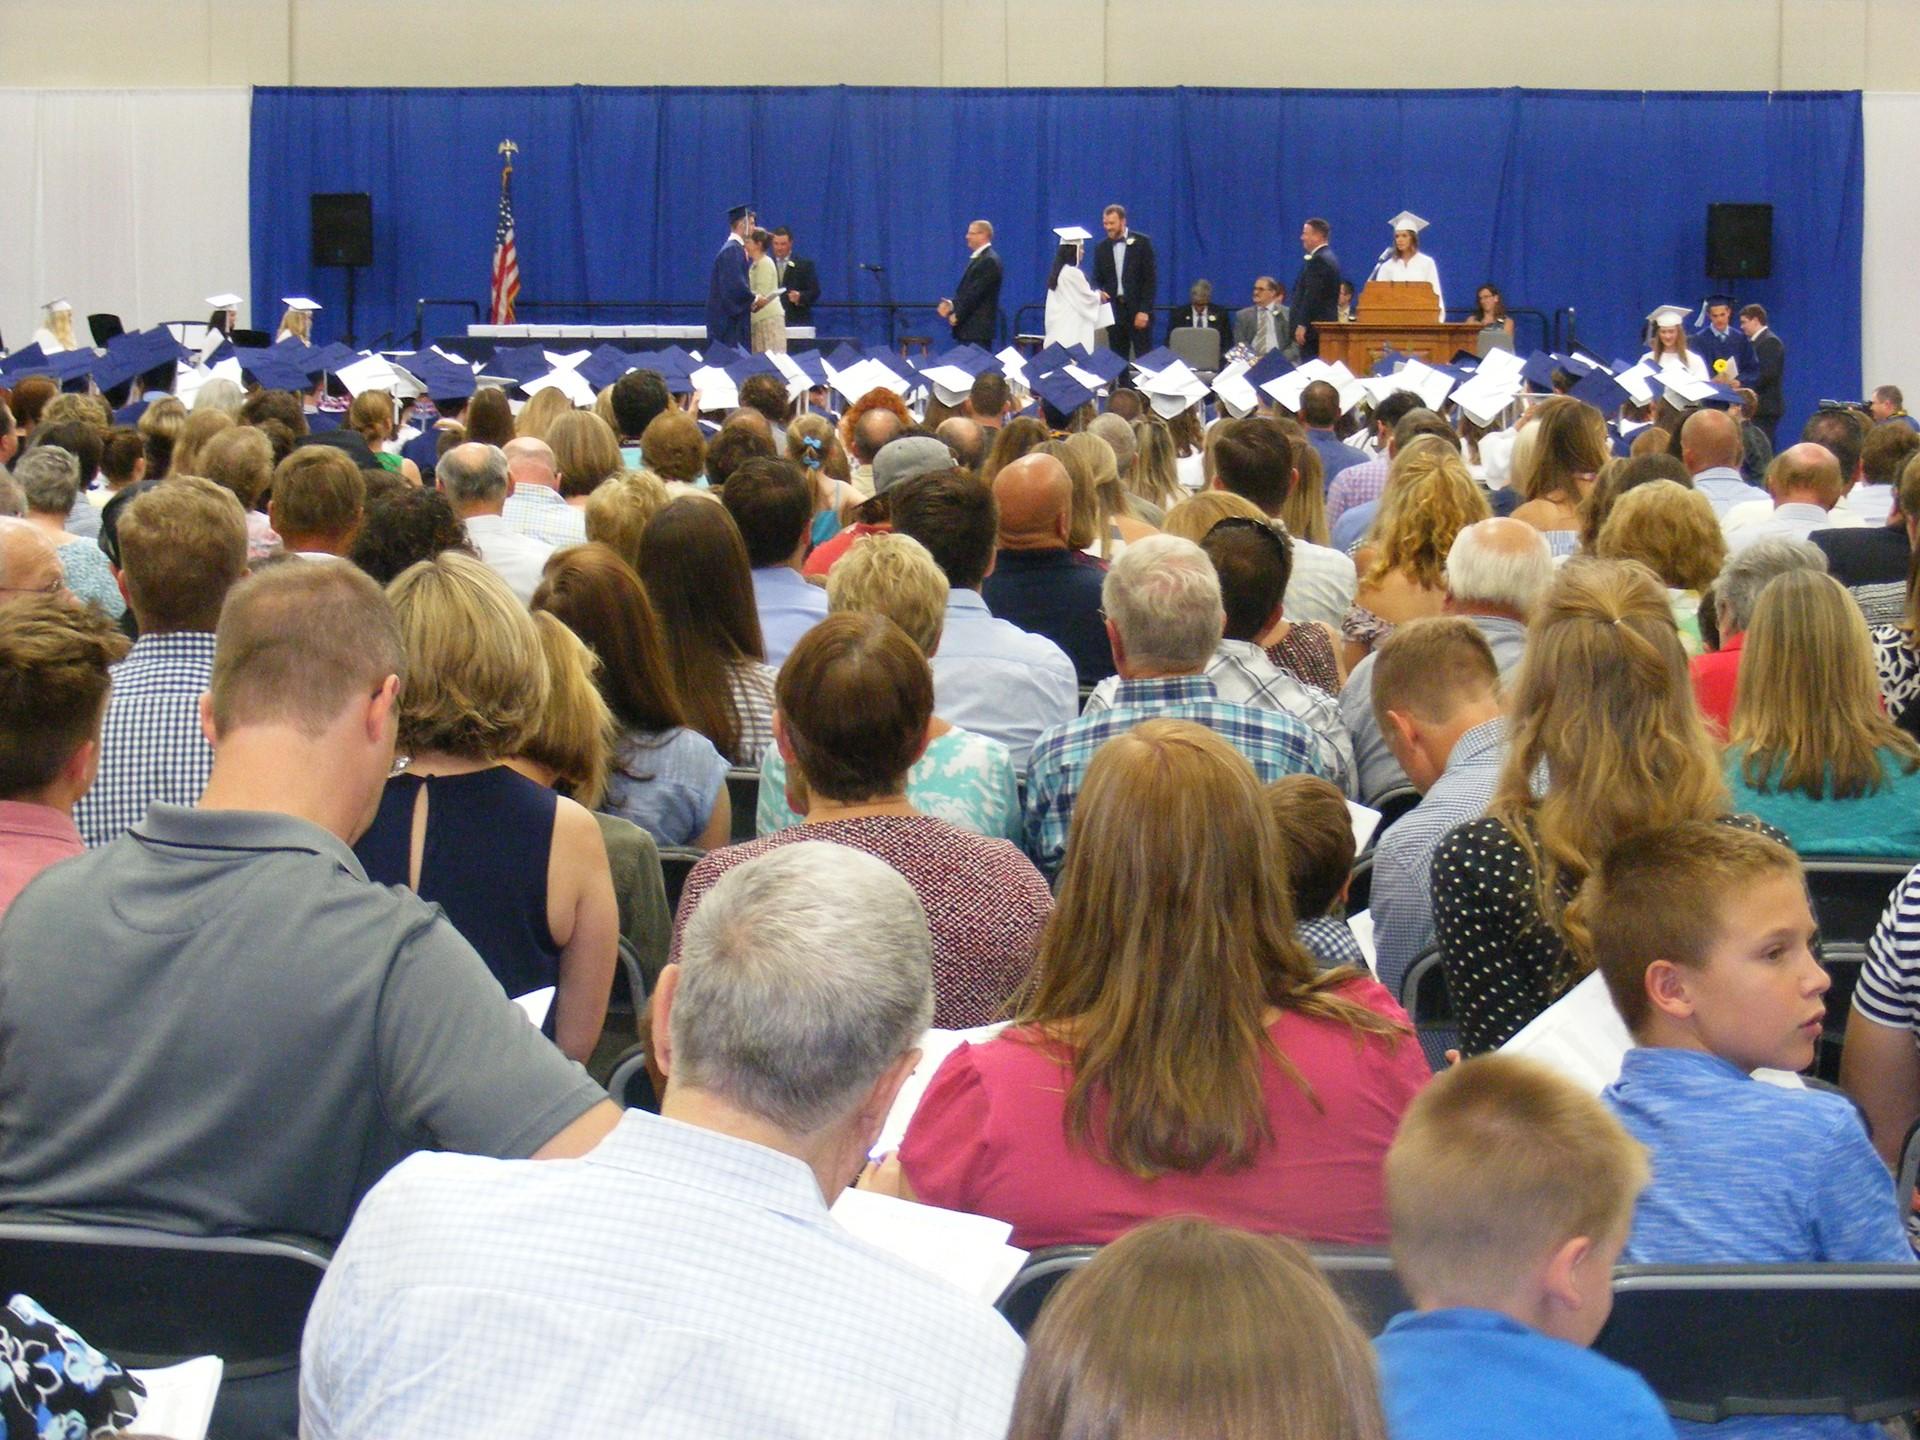 Presenting Diplomas to the Graduates